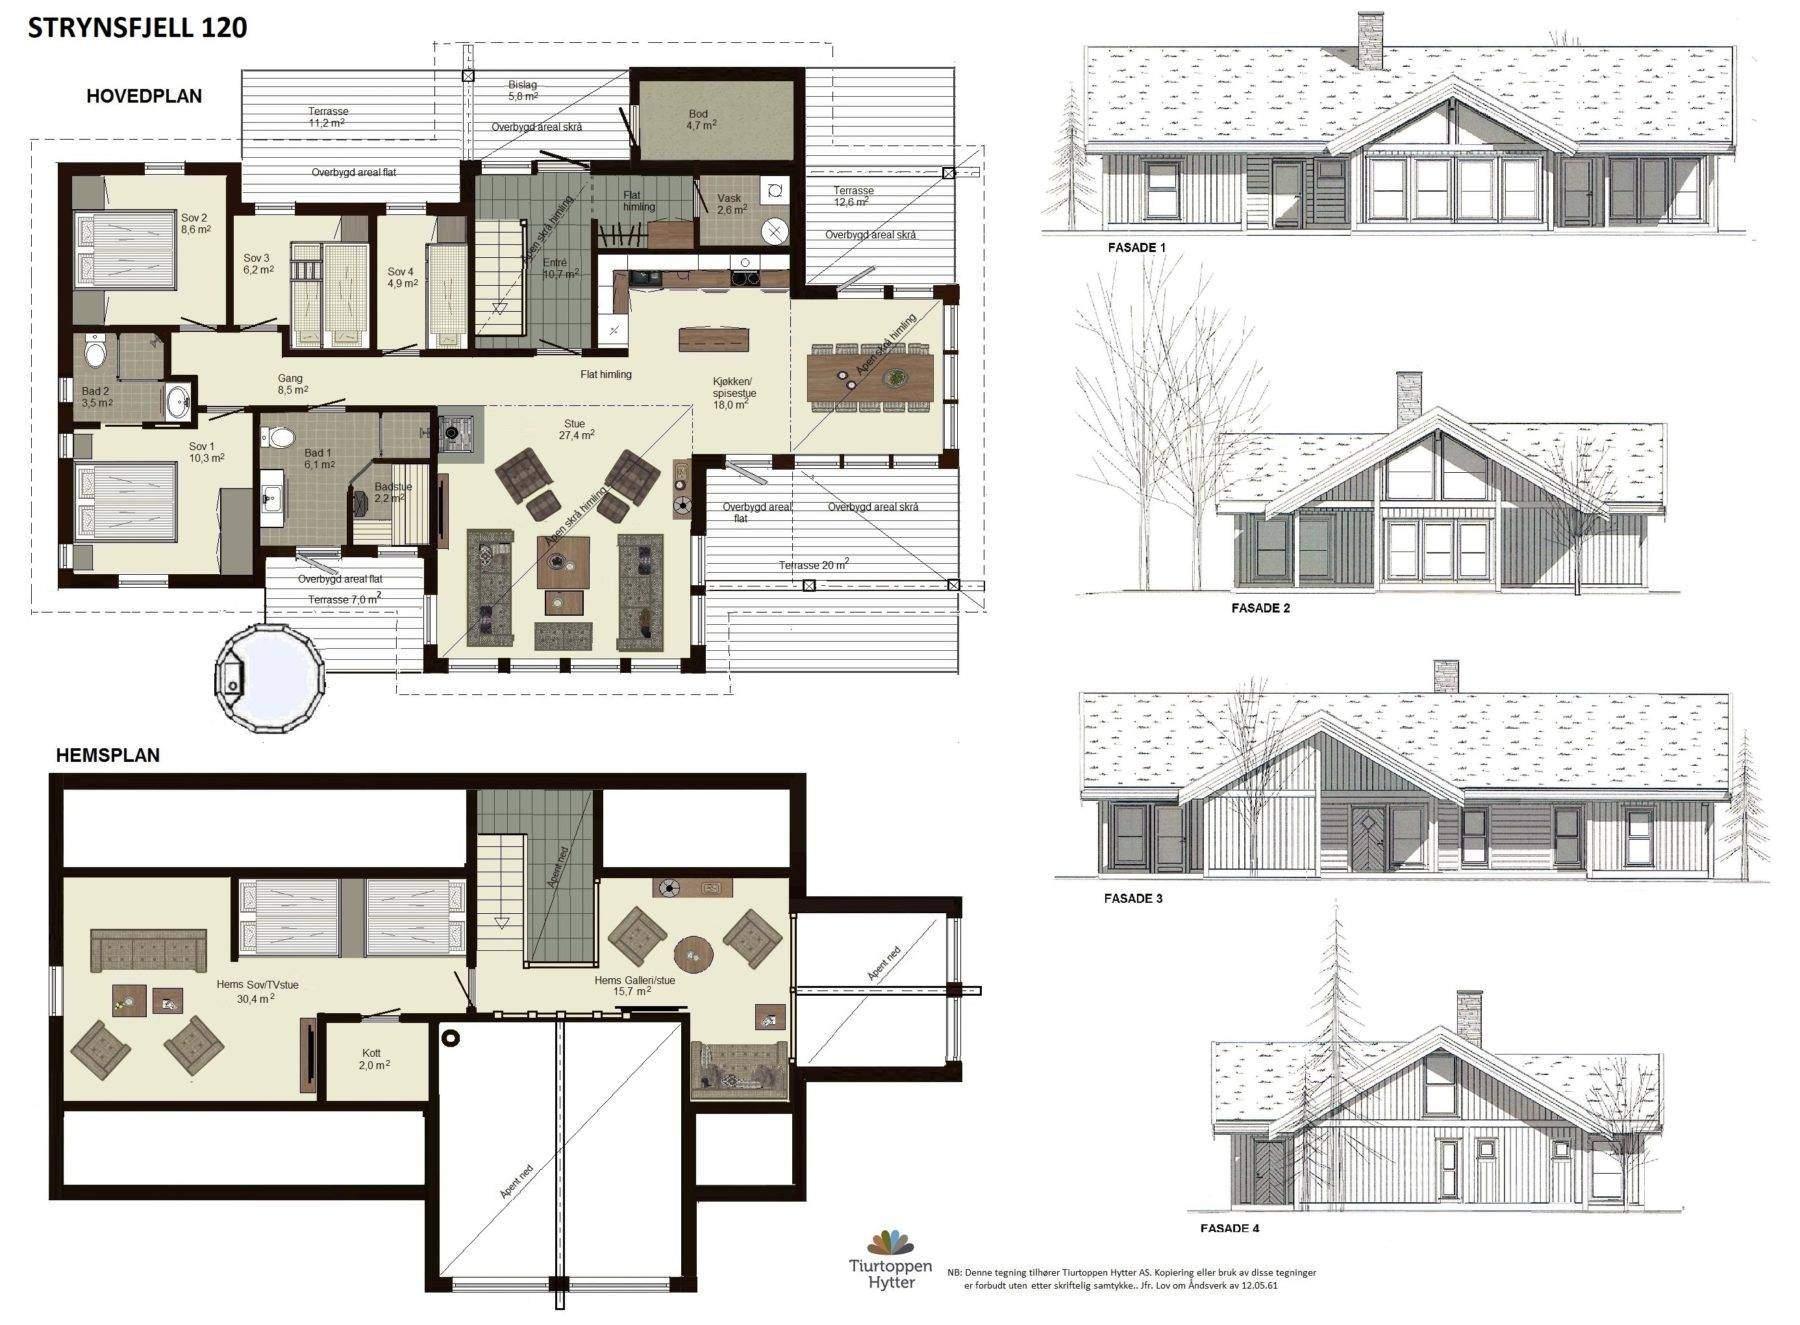 10 Strynsfjell 120 plan og fasader 0